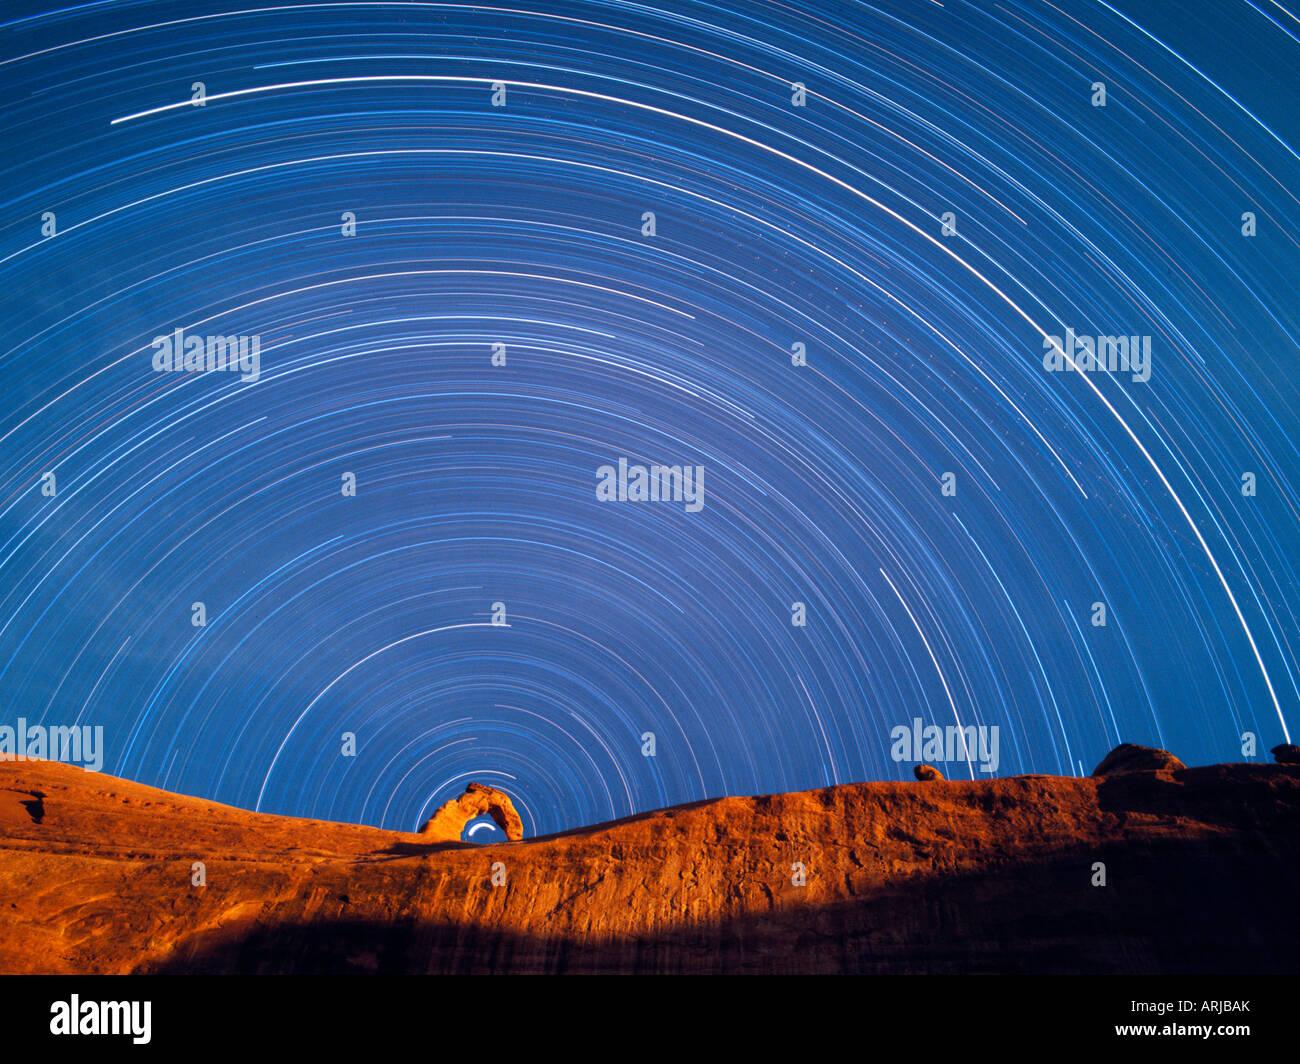 Polaris describes the interior arc of Delicate Arch, Arches National Park Utah - Stock Image